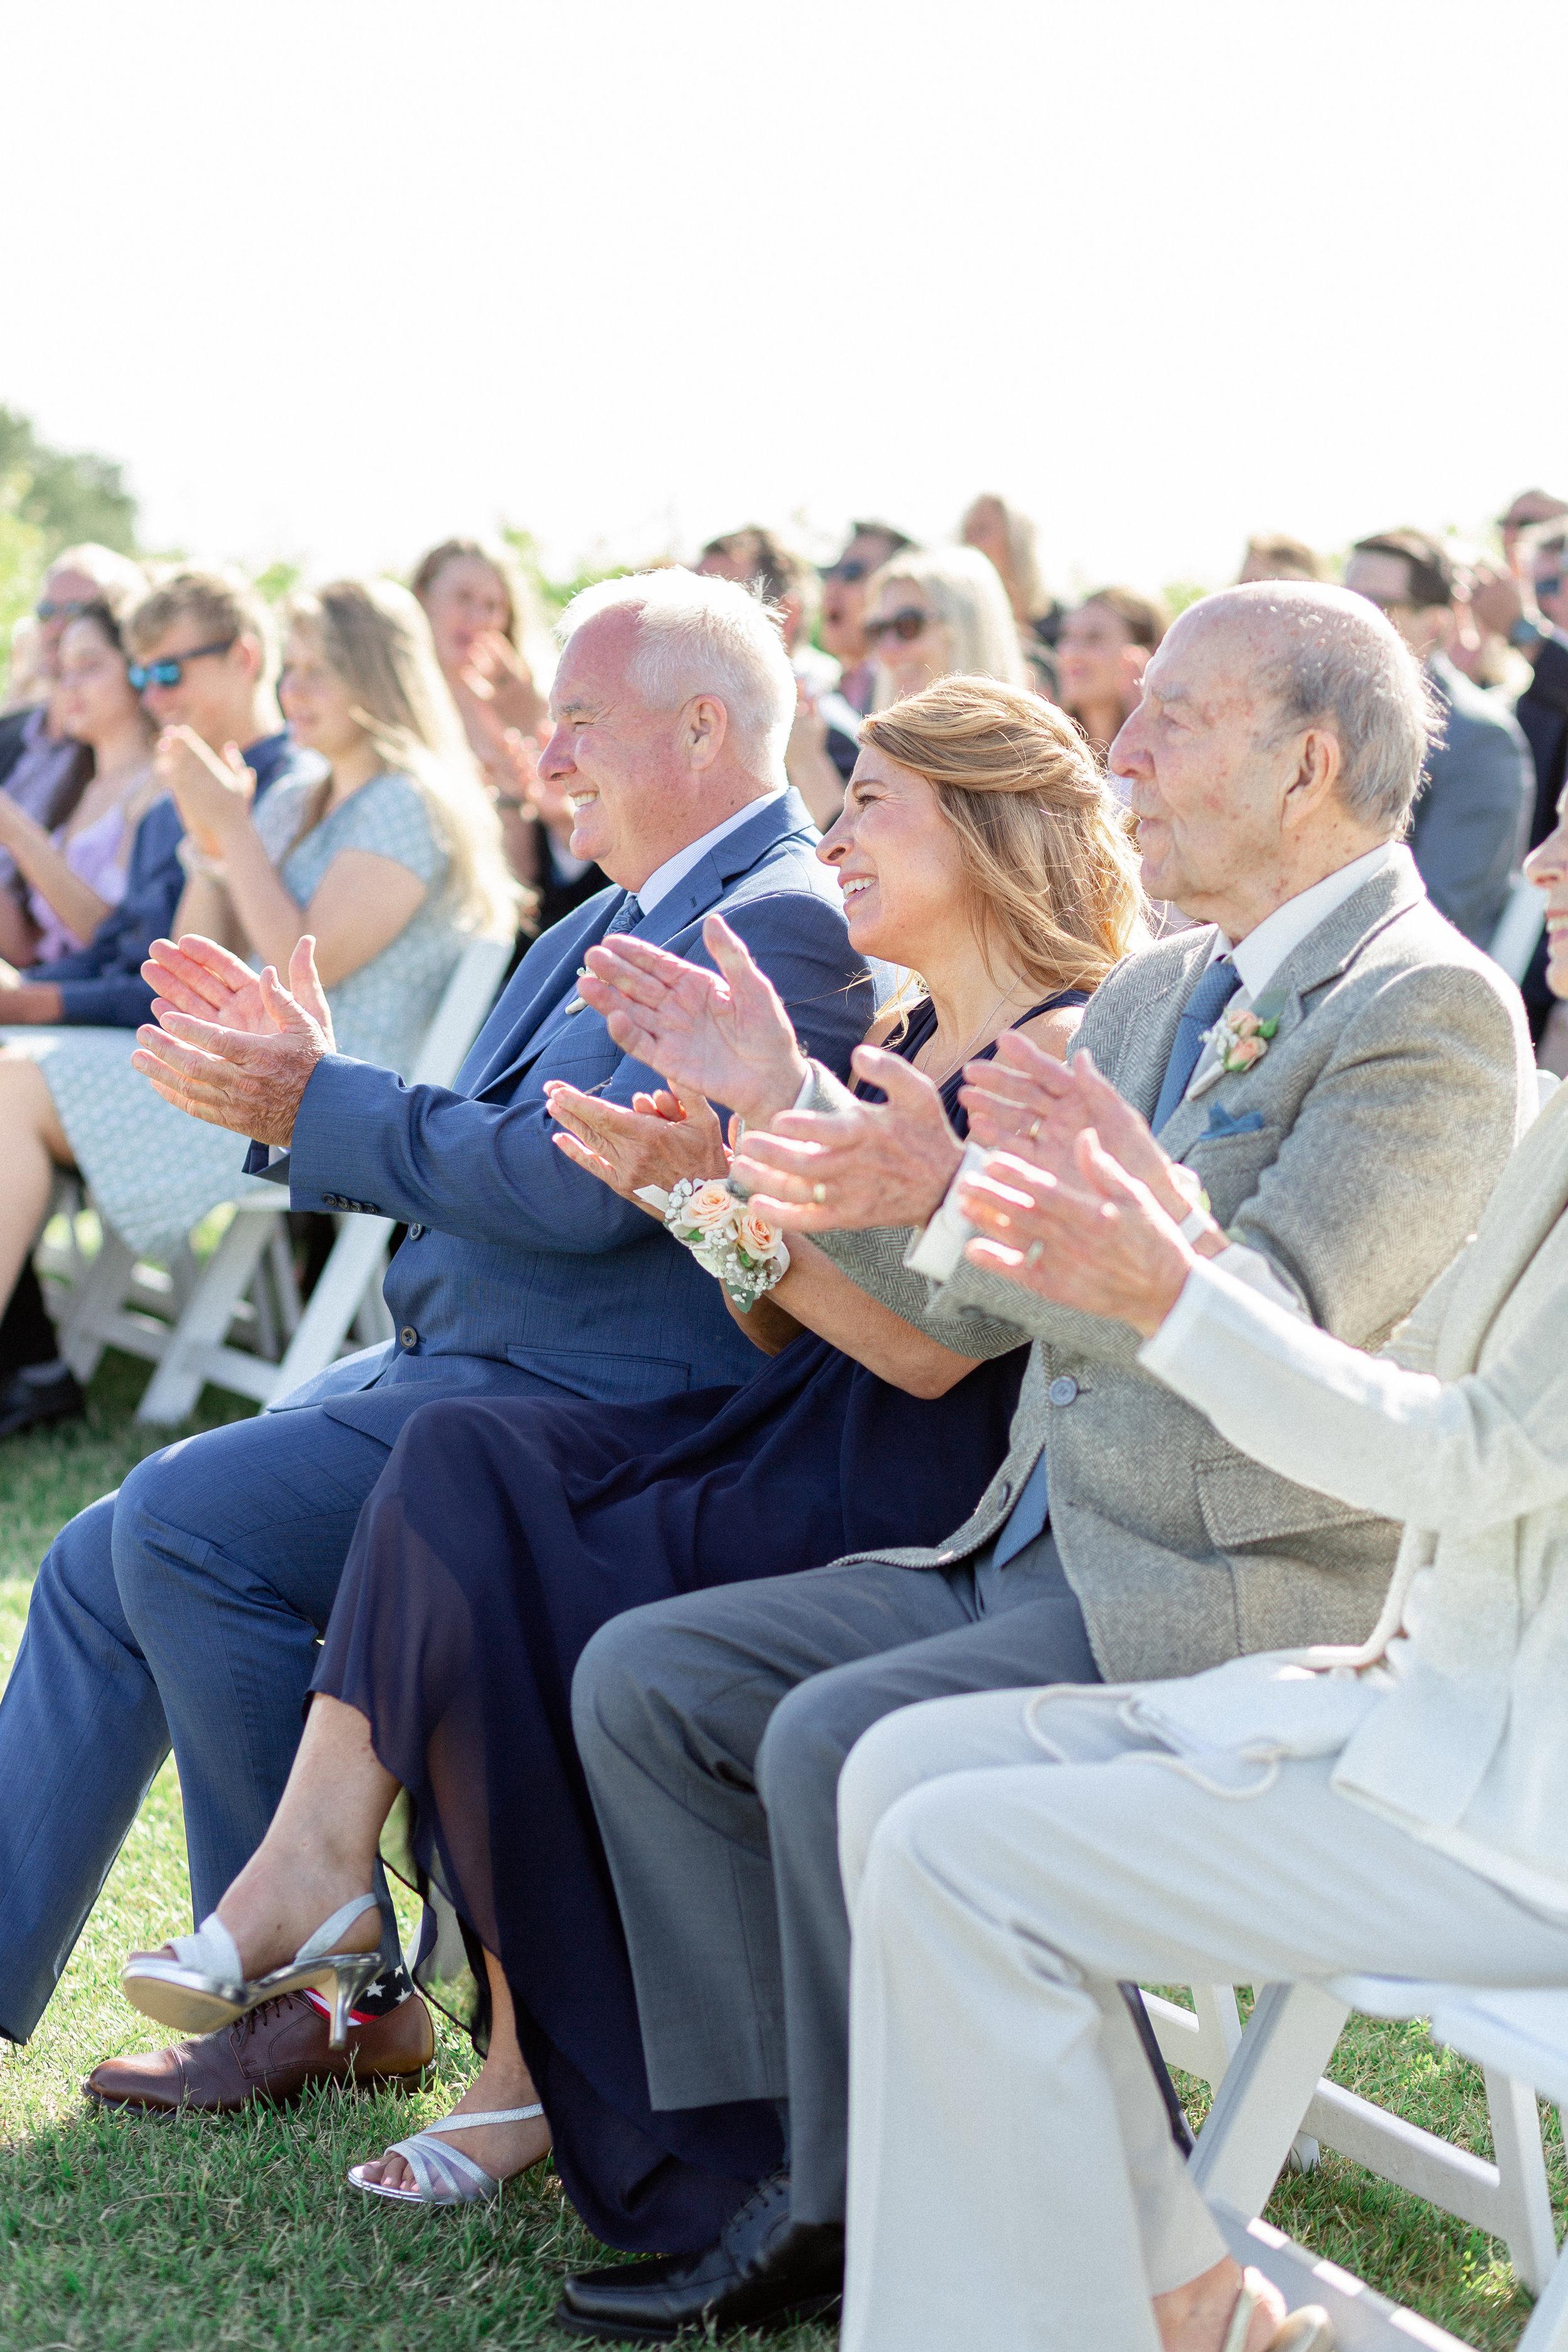 Eagle-Vines-Golf-Course-wedding-photographer (117 of 206).jpg